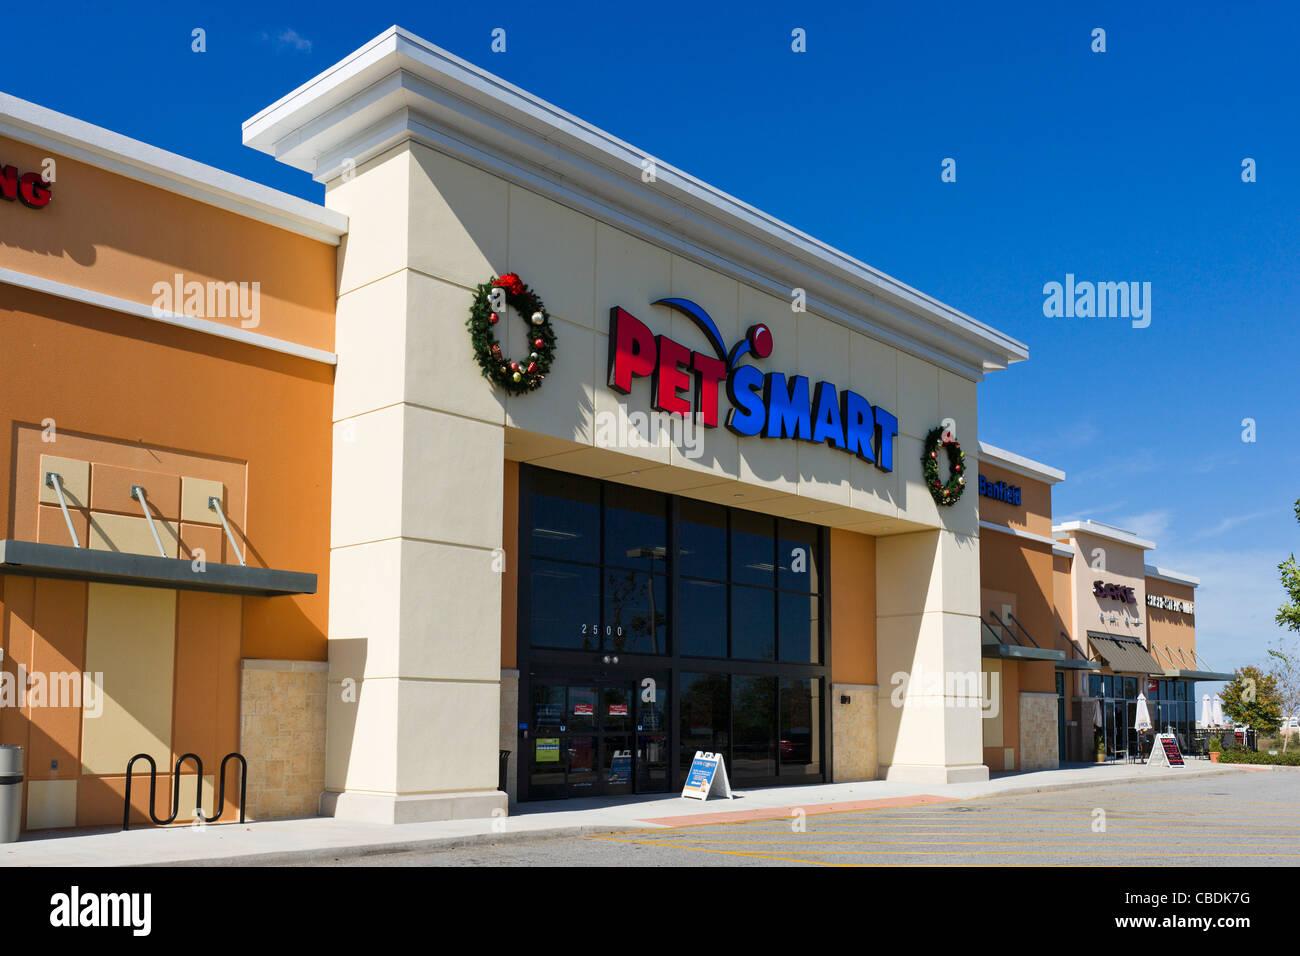 PetSmart store at Posner Park retail development, Davenport, Central Florida, USA - Stock Image